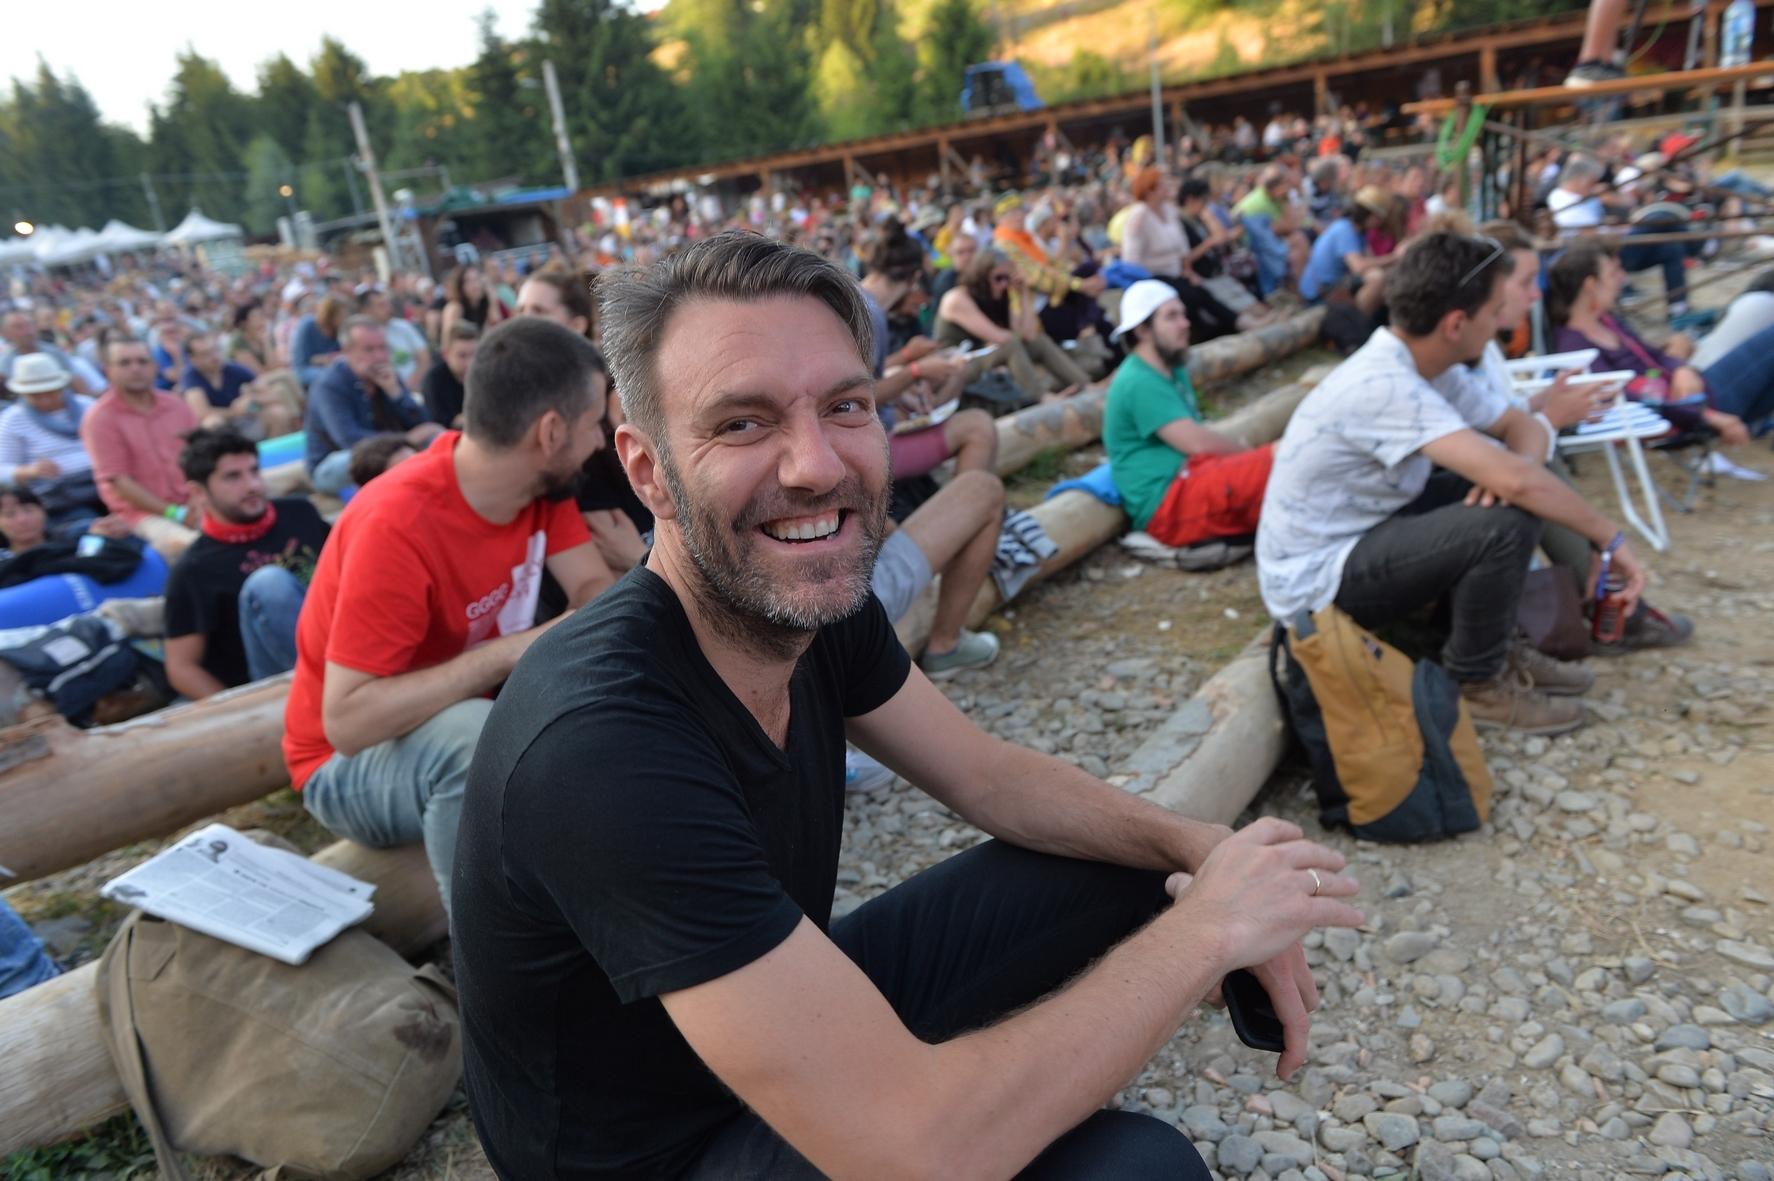 Mats Eilertsen in audience at Garana Jazz Festival 2017